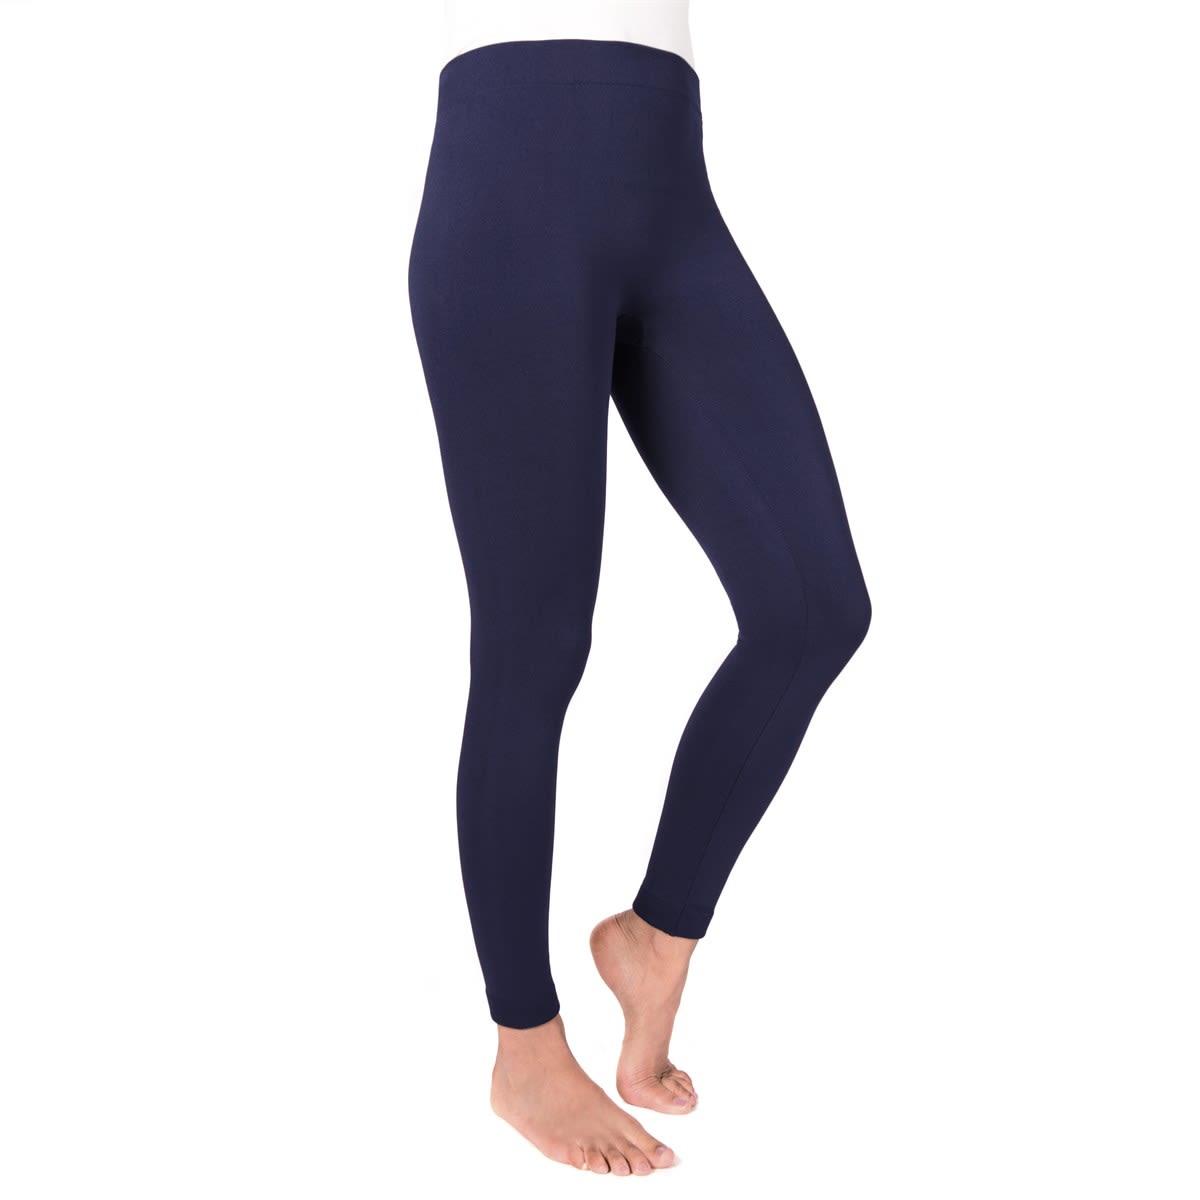 MUK LUKS ® Solid Fleece Lined Leggings | Free Shipping